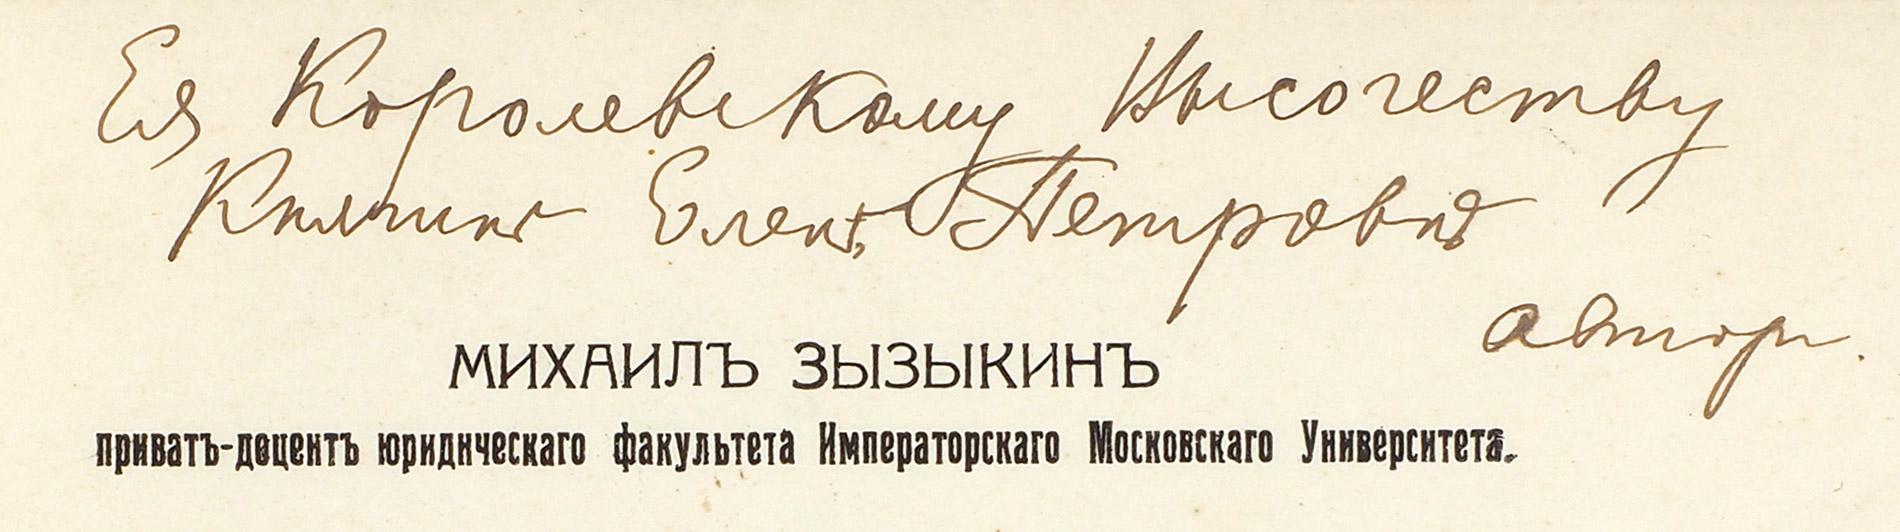 Автограф на обложке. https://www.litfund.ru/auction/107/299/